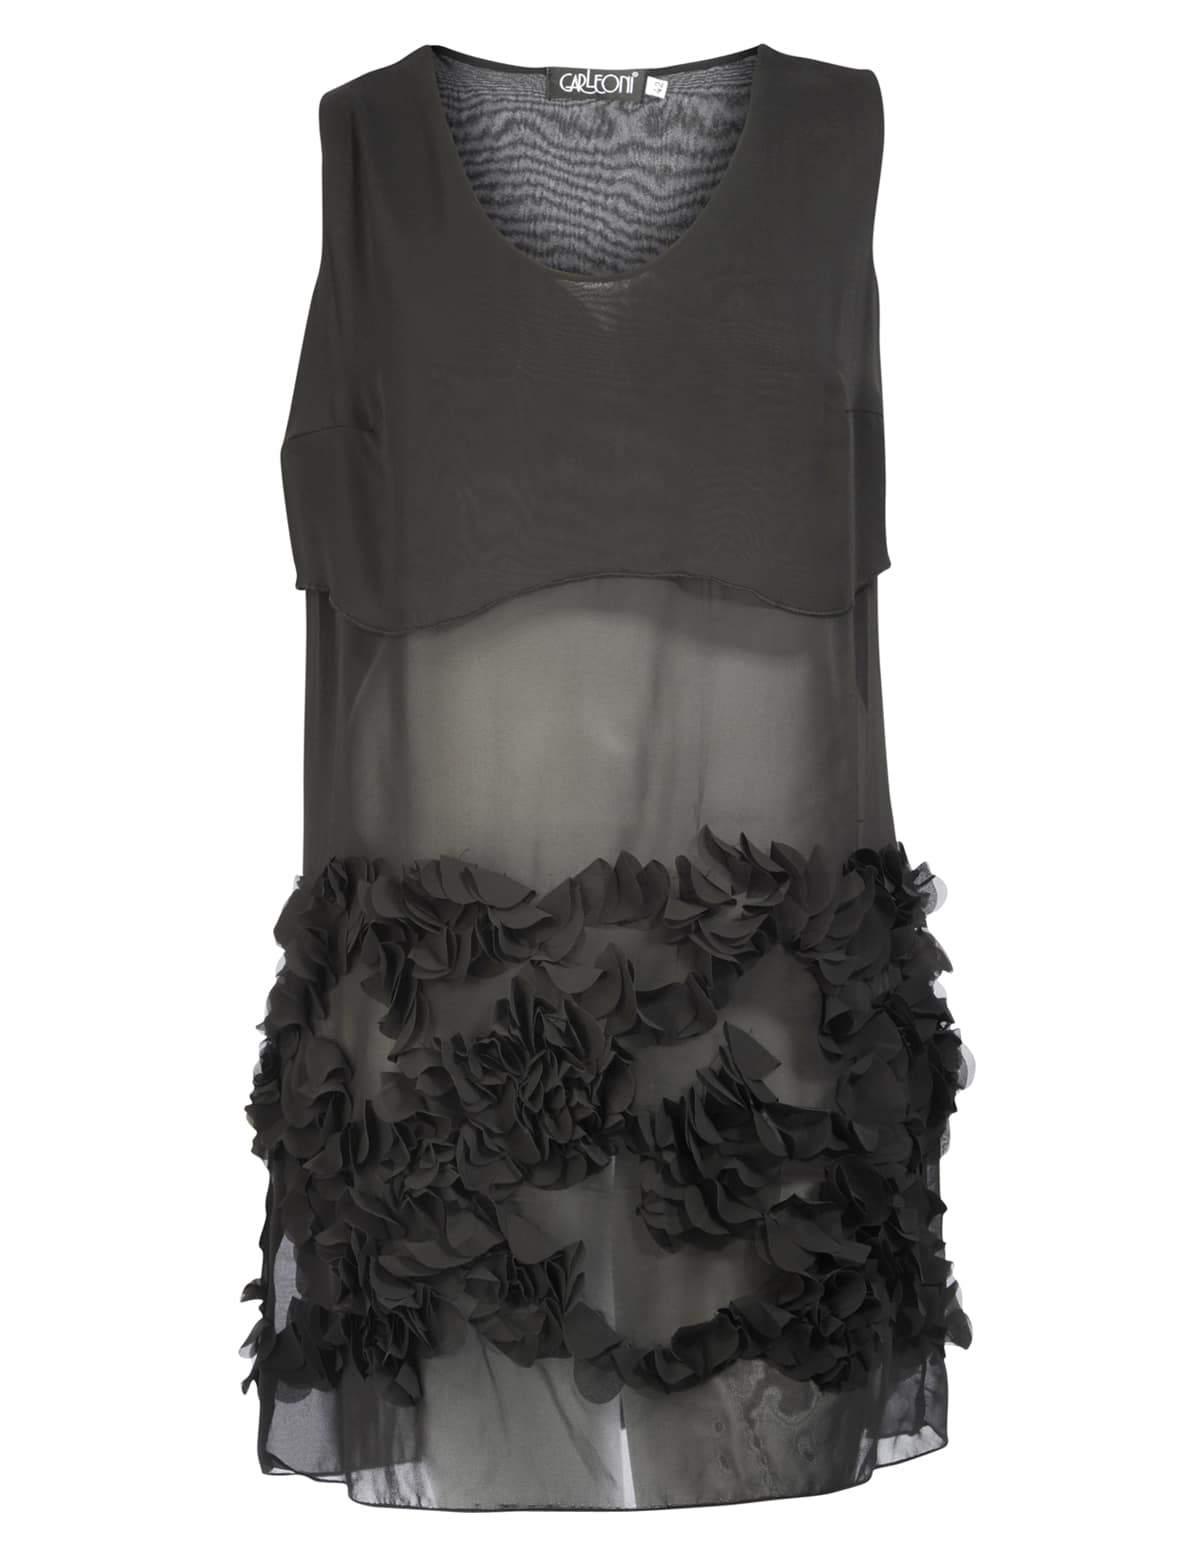 Carleoni Chiffon Plus Size Sheer Dress from Navabi